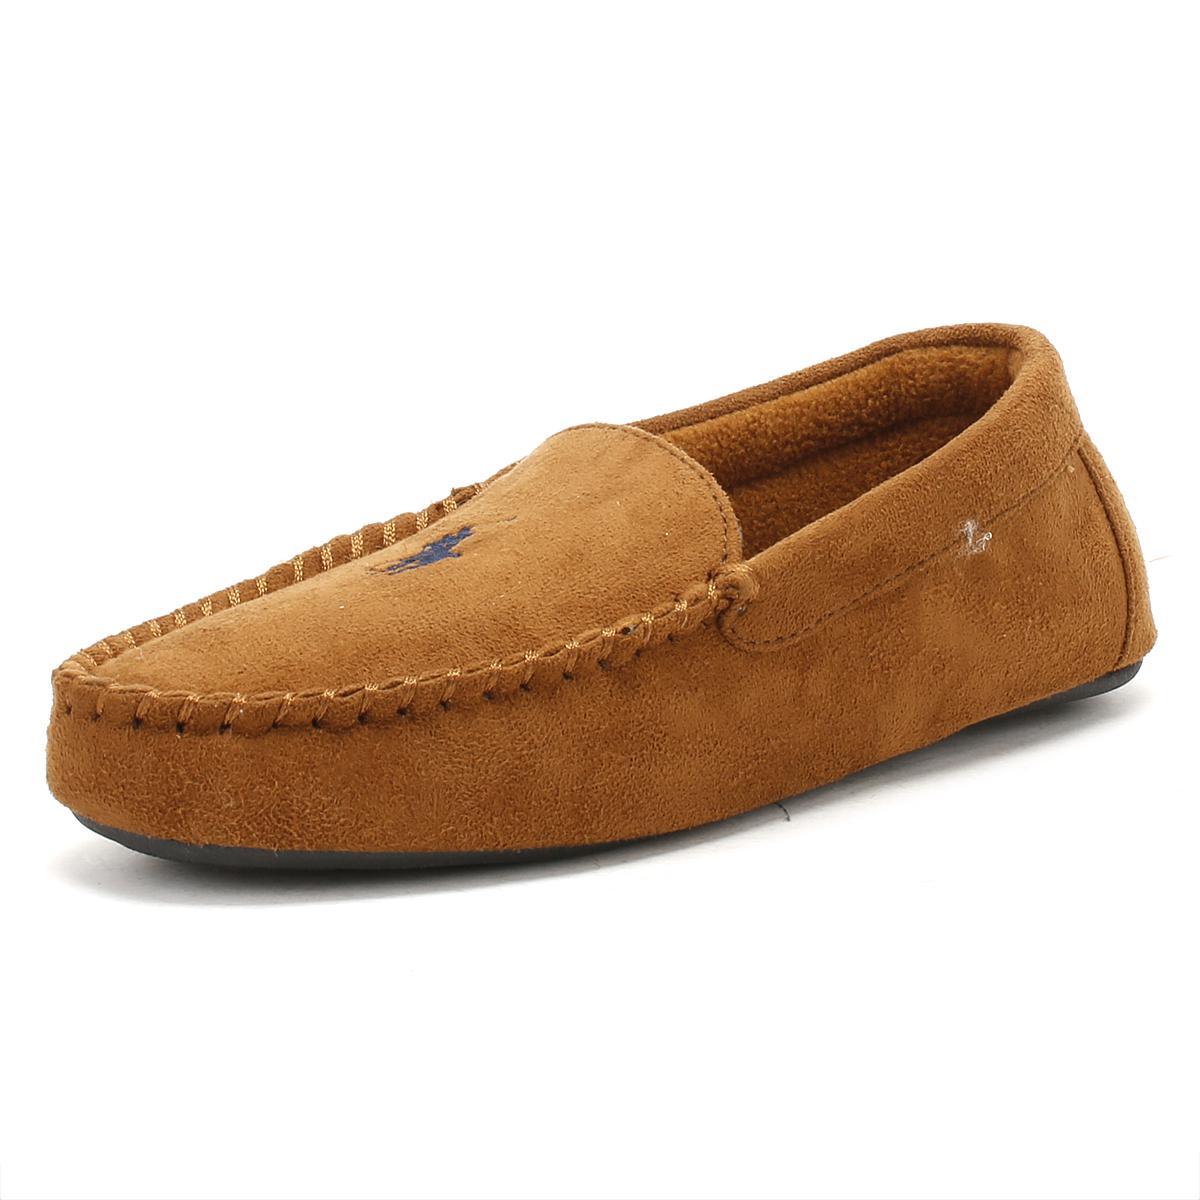 9769f0fcf Ralph Lauren Mens Snuff Tan / Navy Dezi Ii Moccasin Slippers in ...